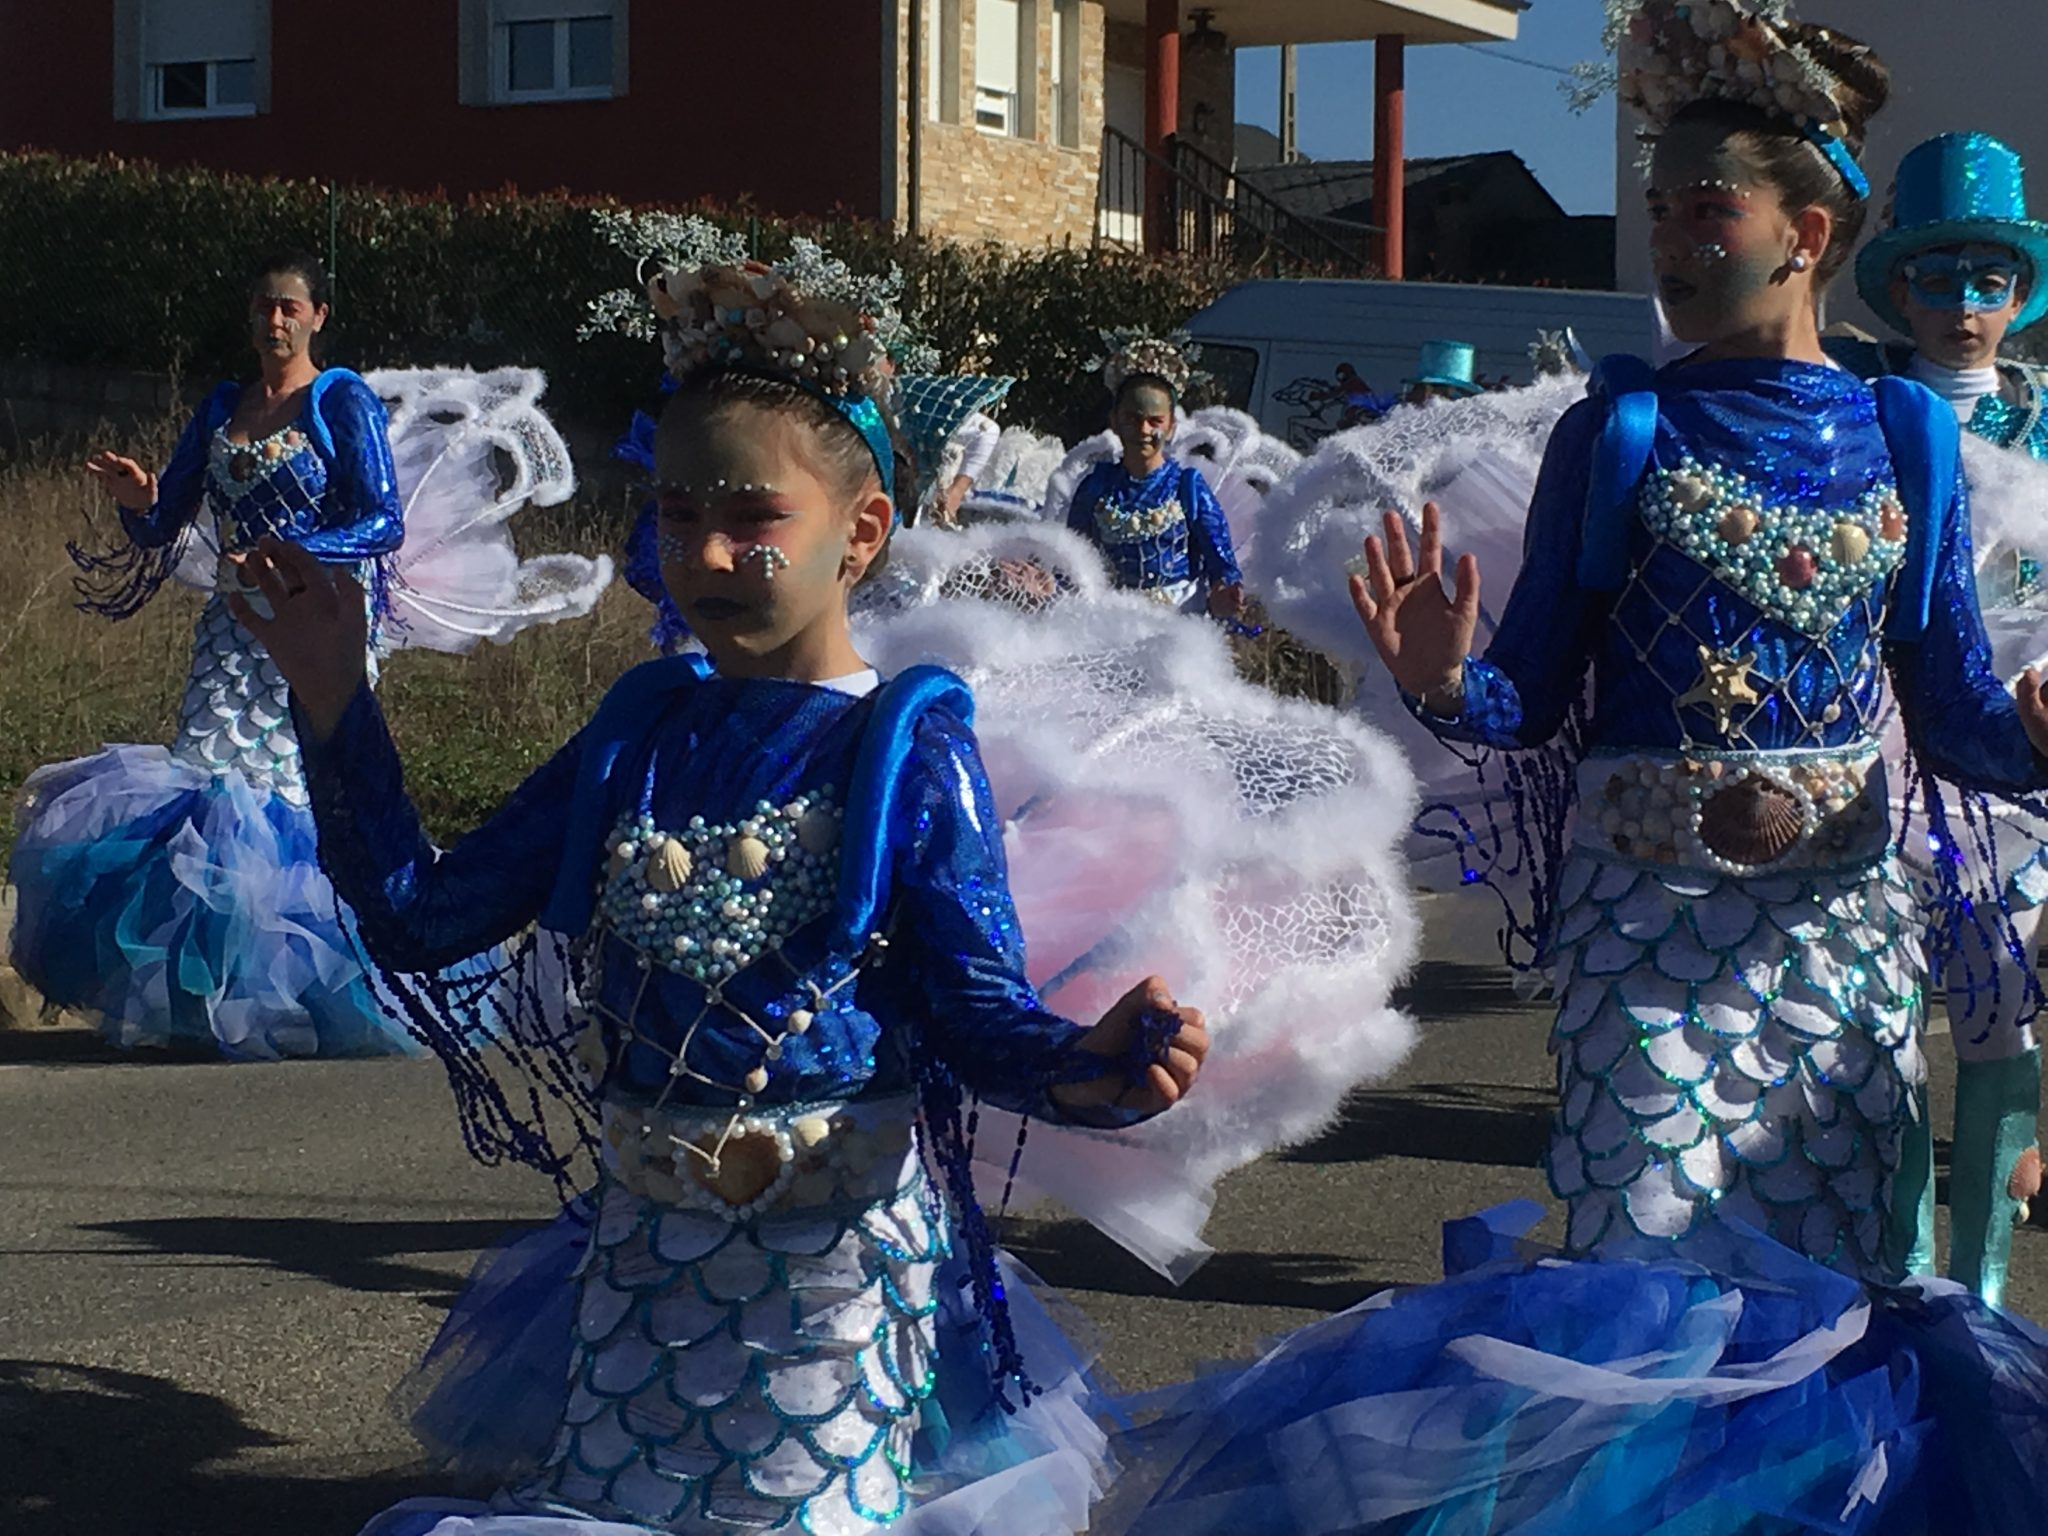 Álbum de fotos Carnaval Cabañas Raras 2019 23